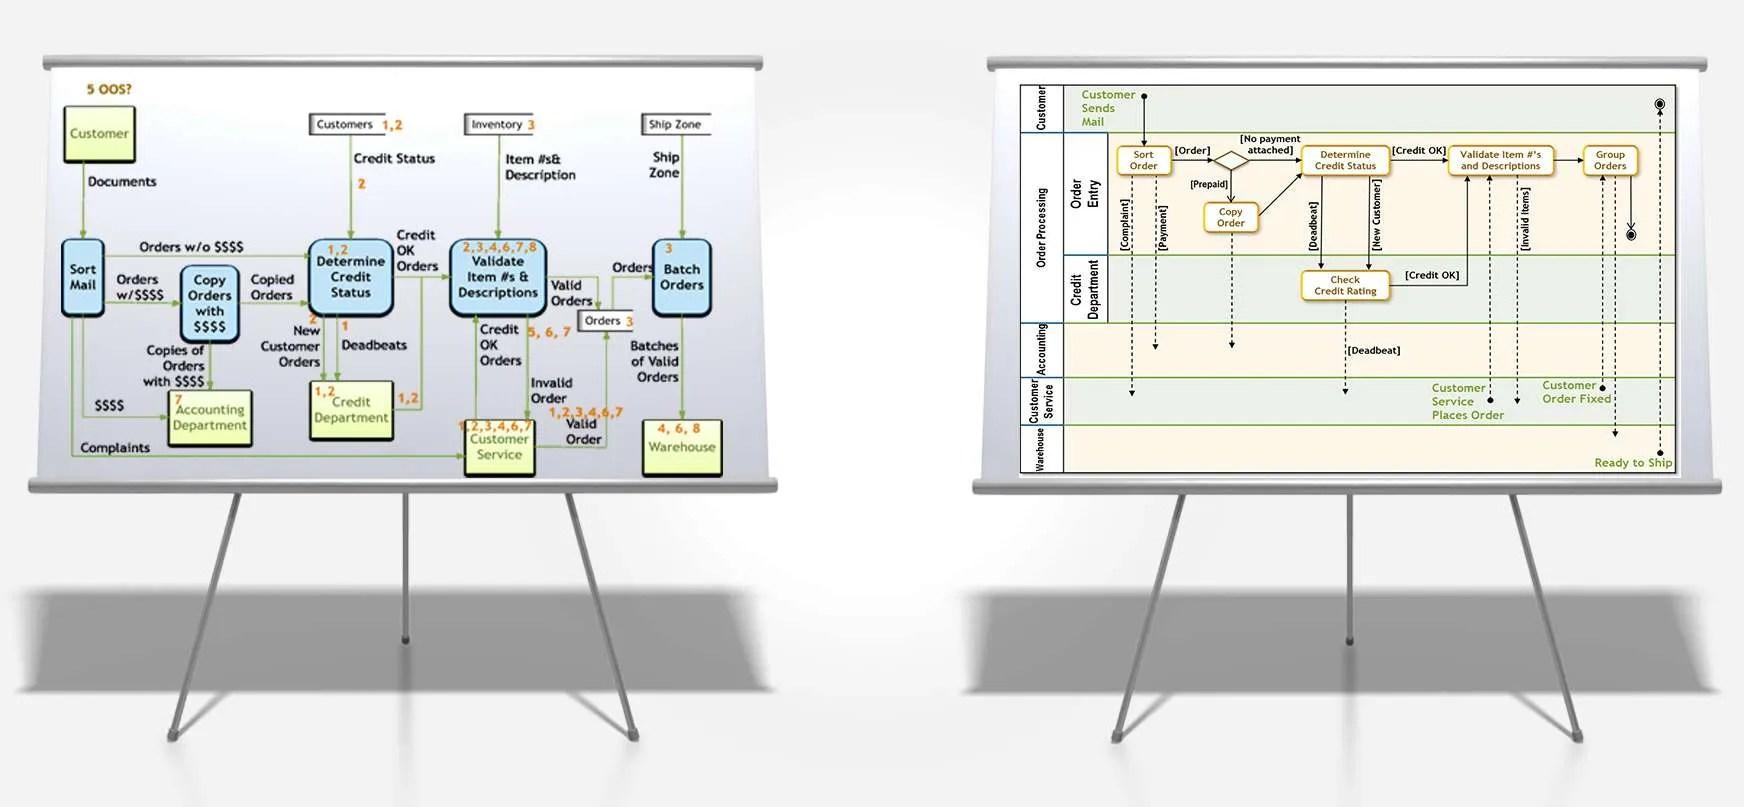 WRG-0721] Process Flow Diagram Vs Sequence Diagram